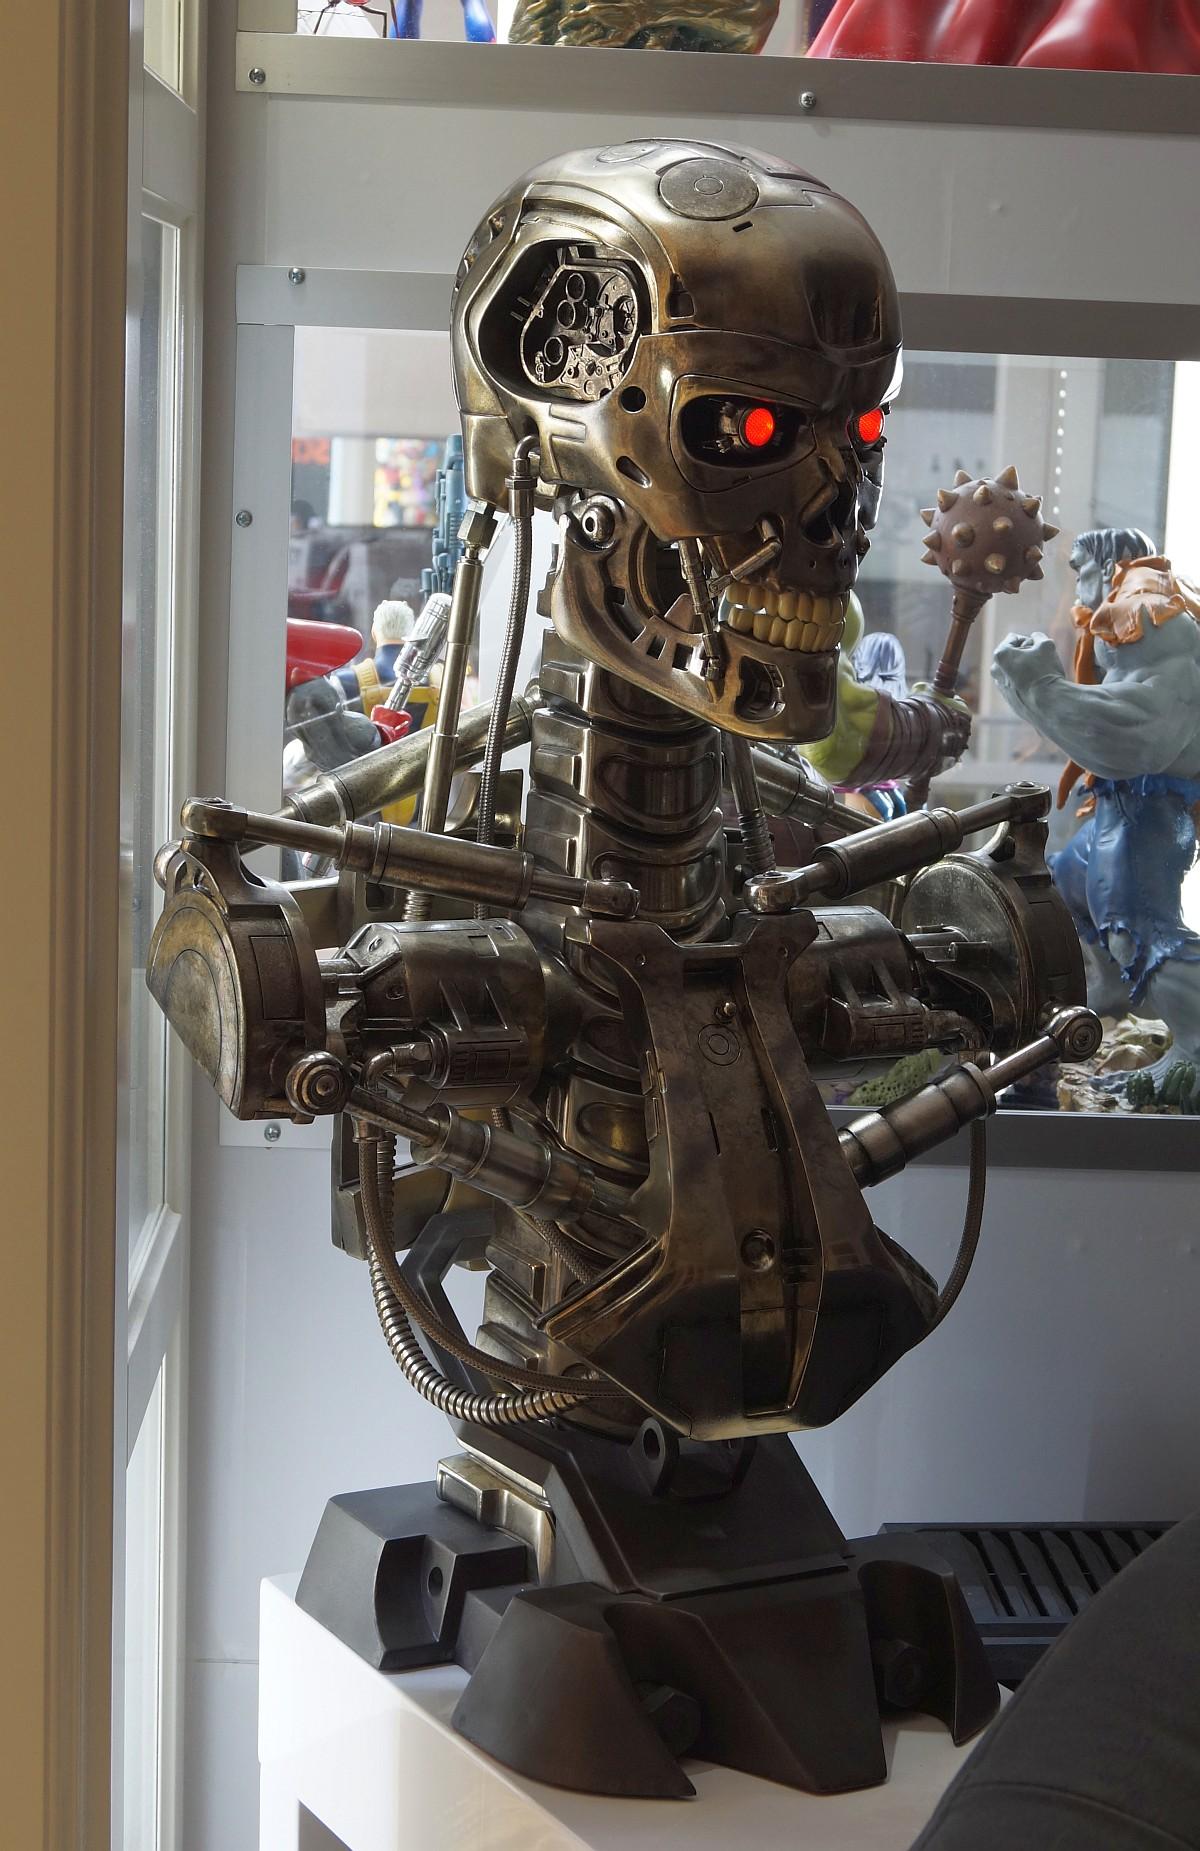 [Bild: Terminator_Endo02_klein.jpg]